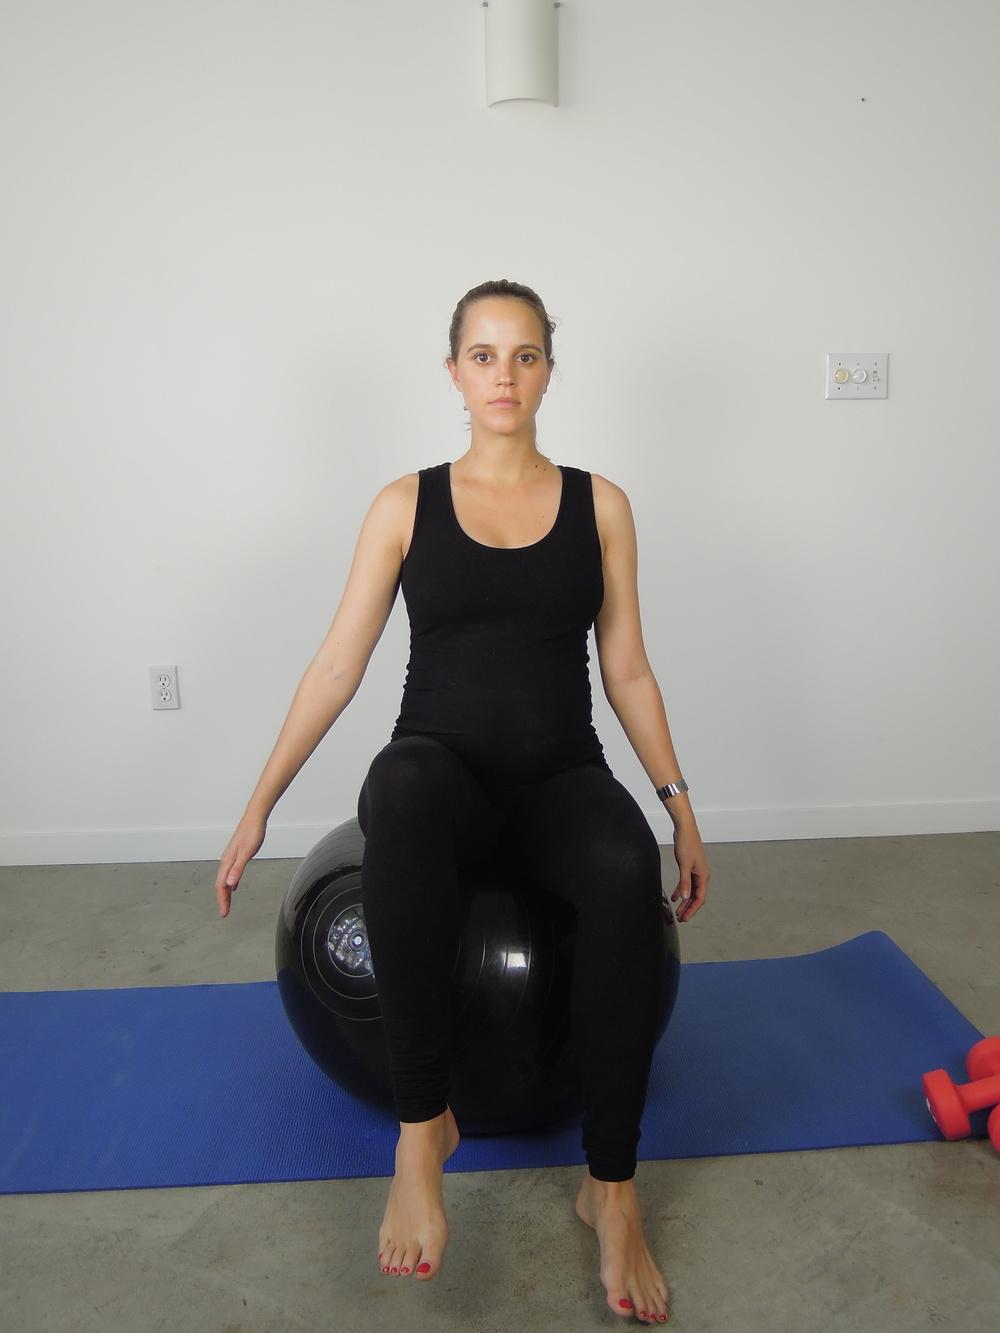 Sitting single leg balance